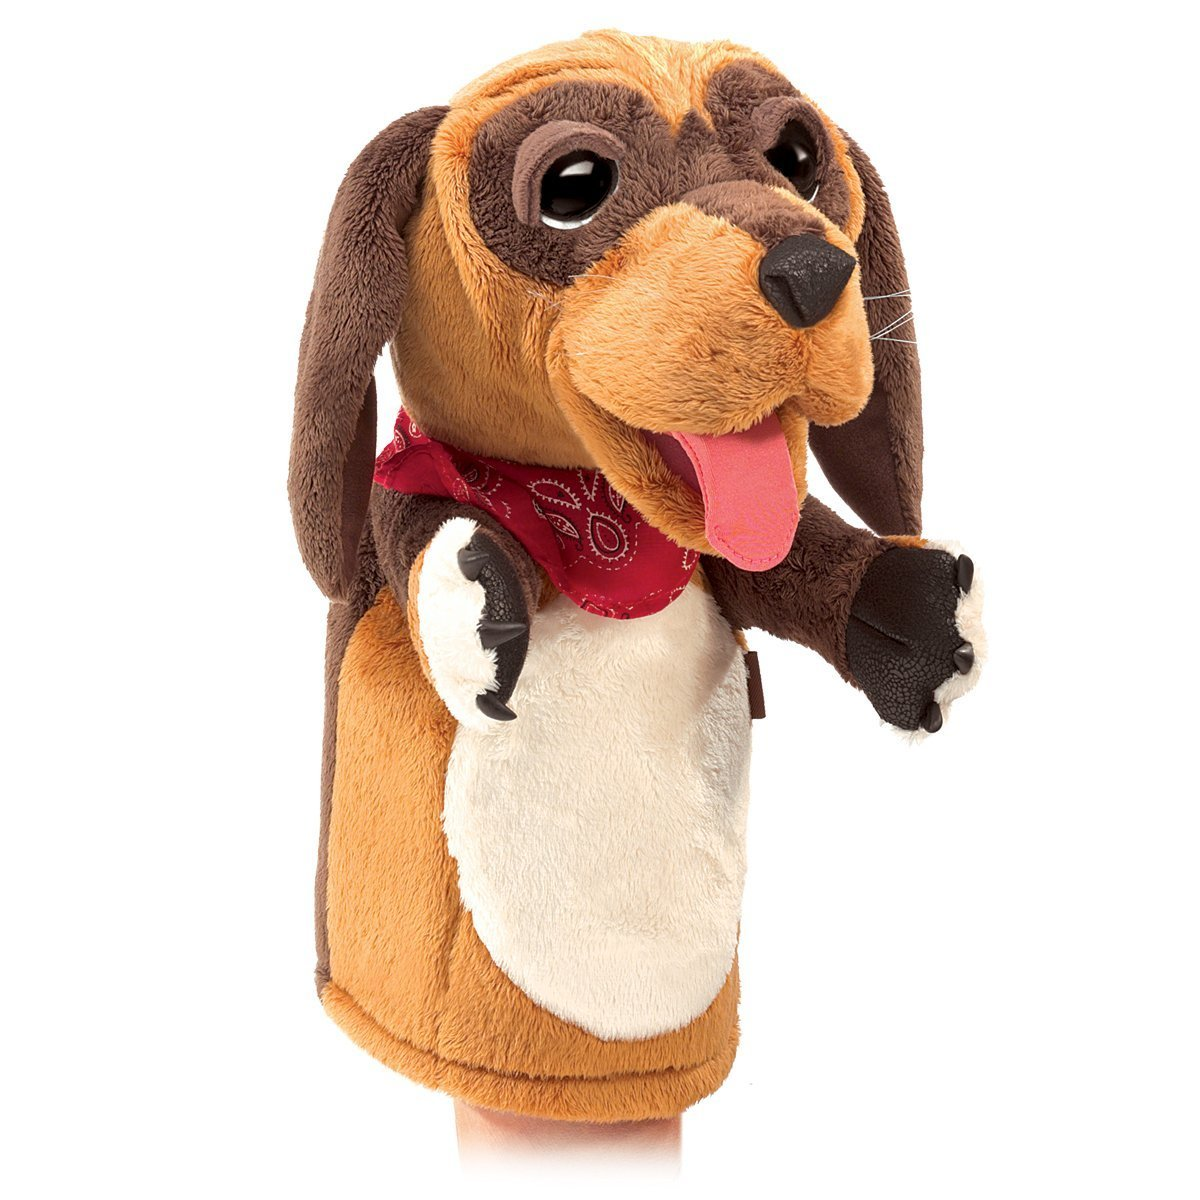 Folkmanis Hand Puppet - Stage Dog image